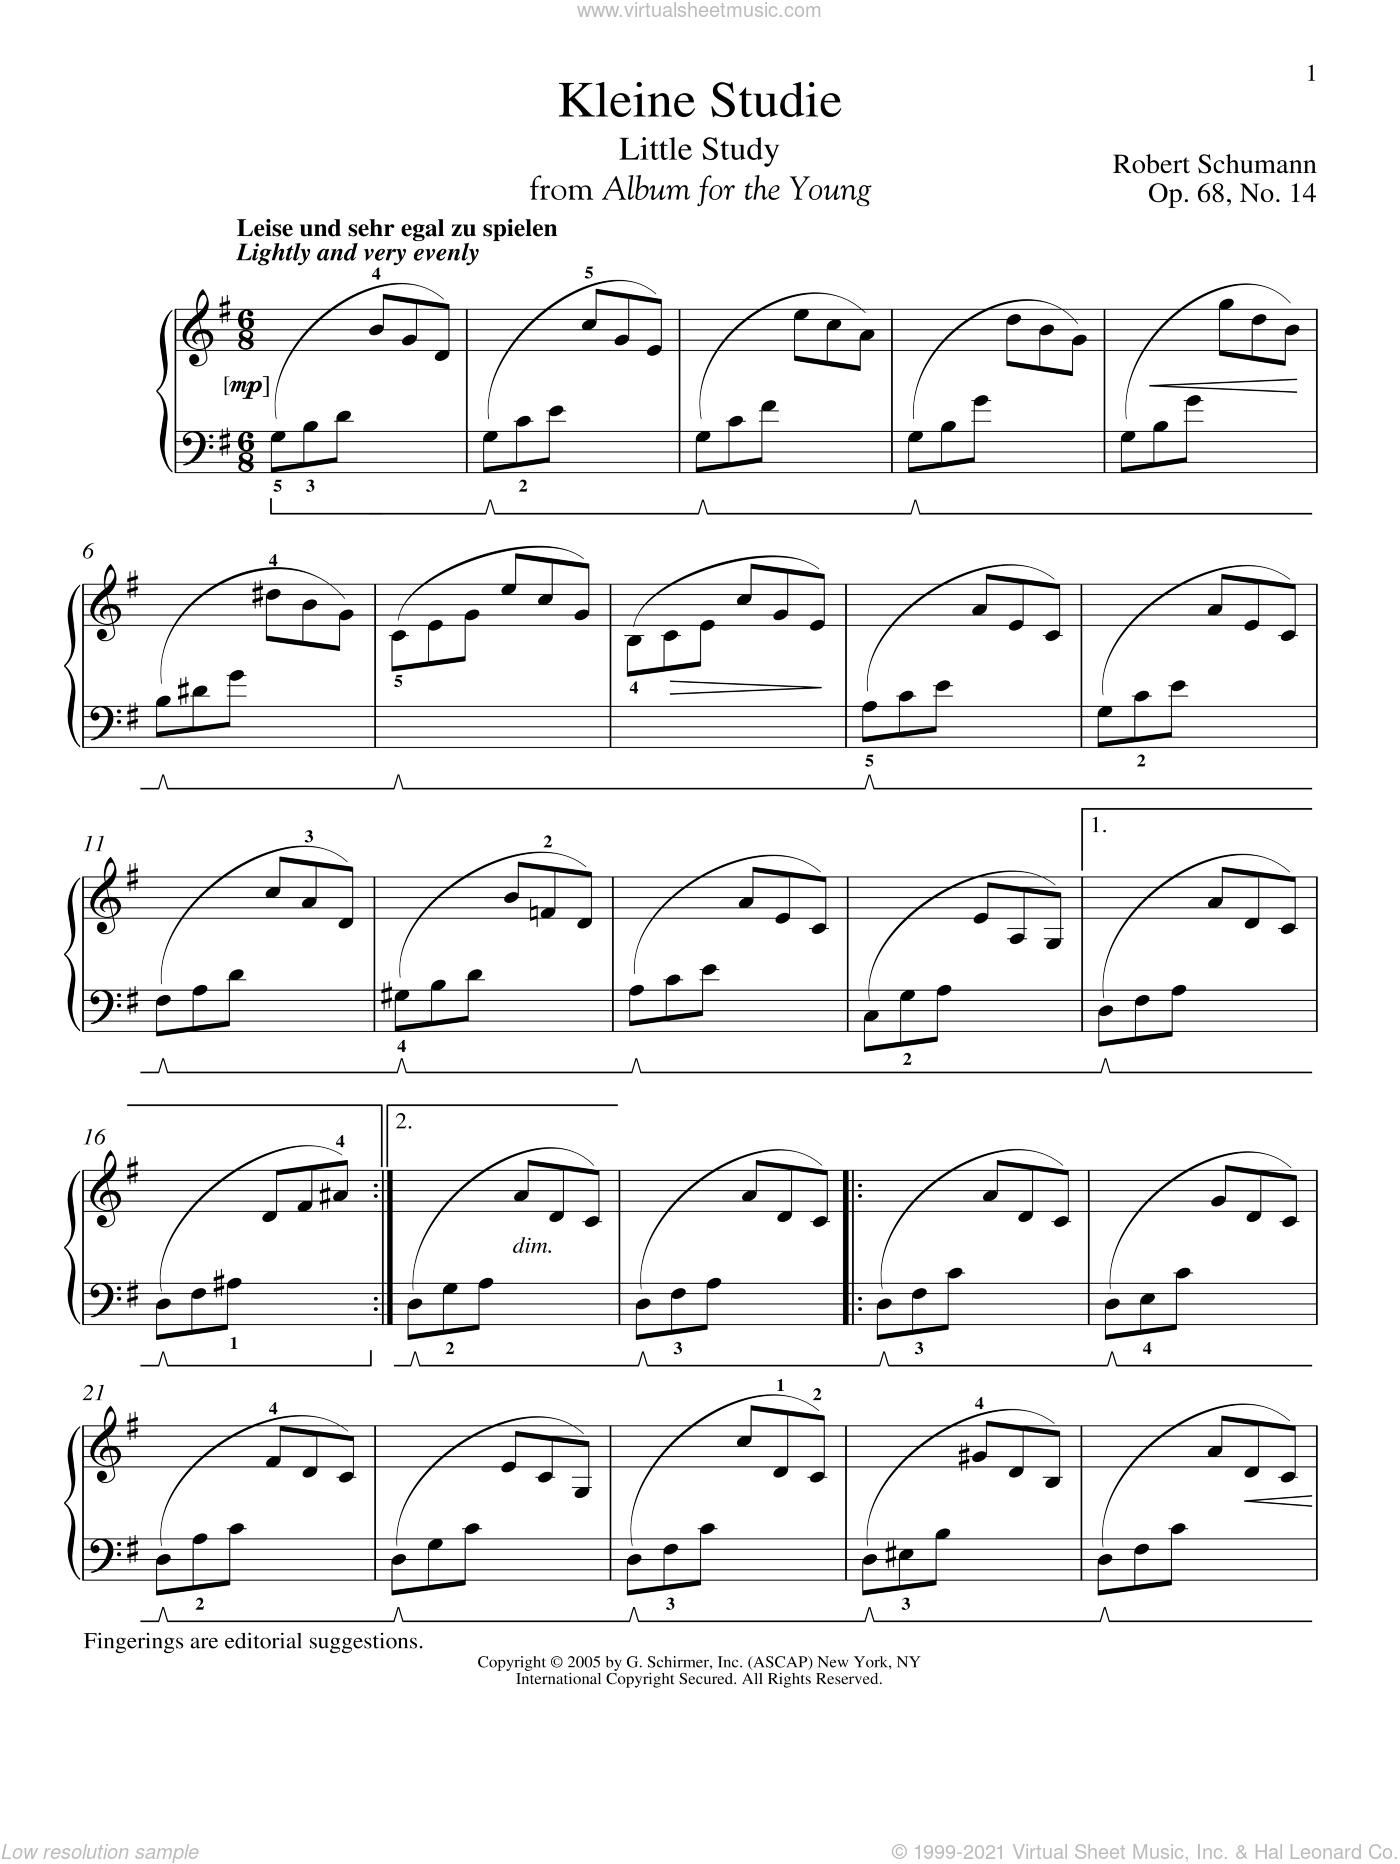 Little Study, Op. 68, No. 14 (Kleine Studie) sheet music for piano solo by Robert Schumann, classical score, intermediate skill level